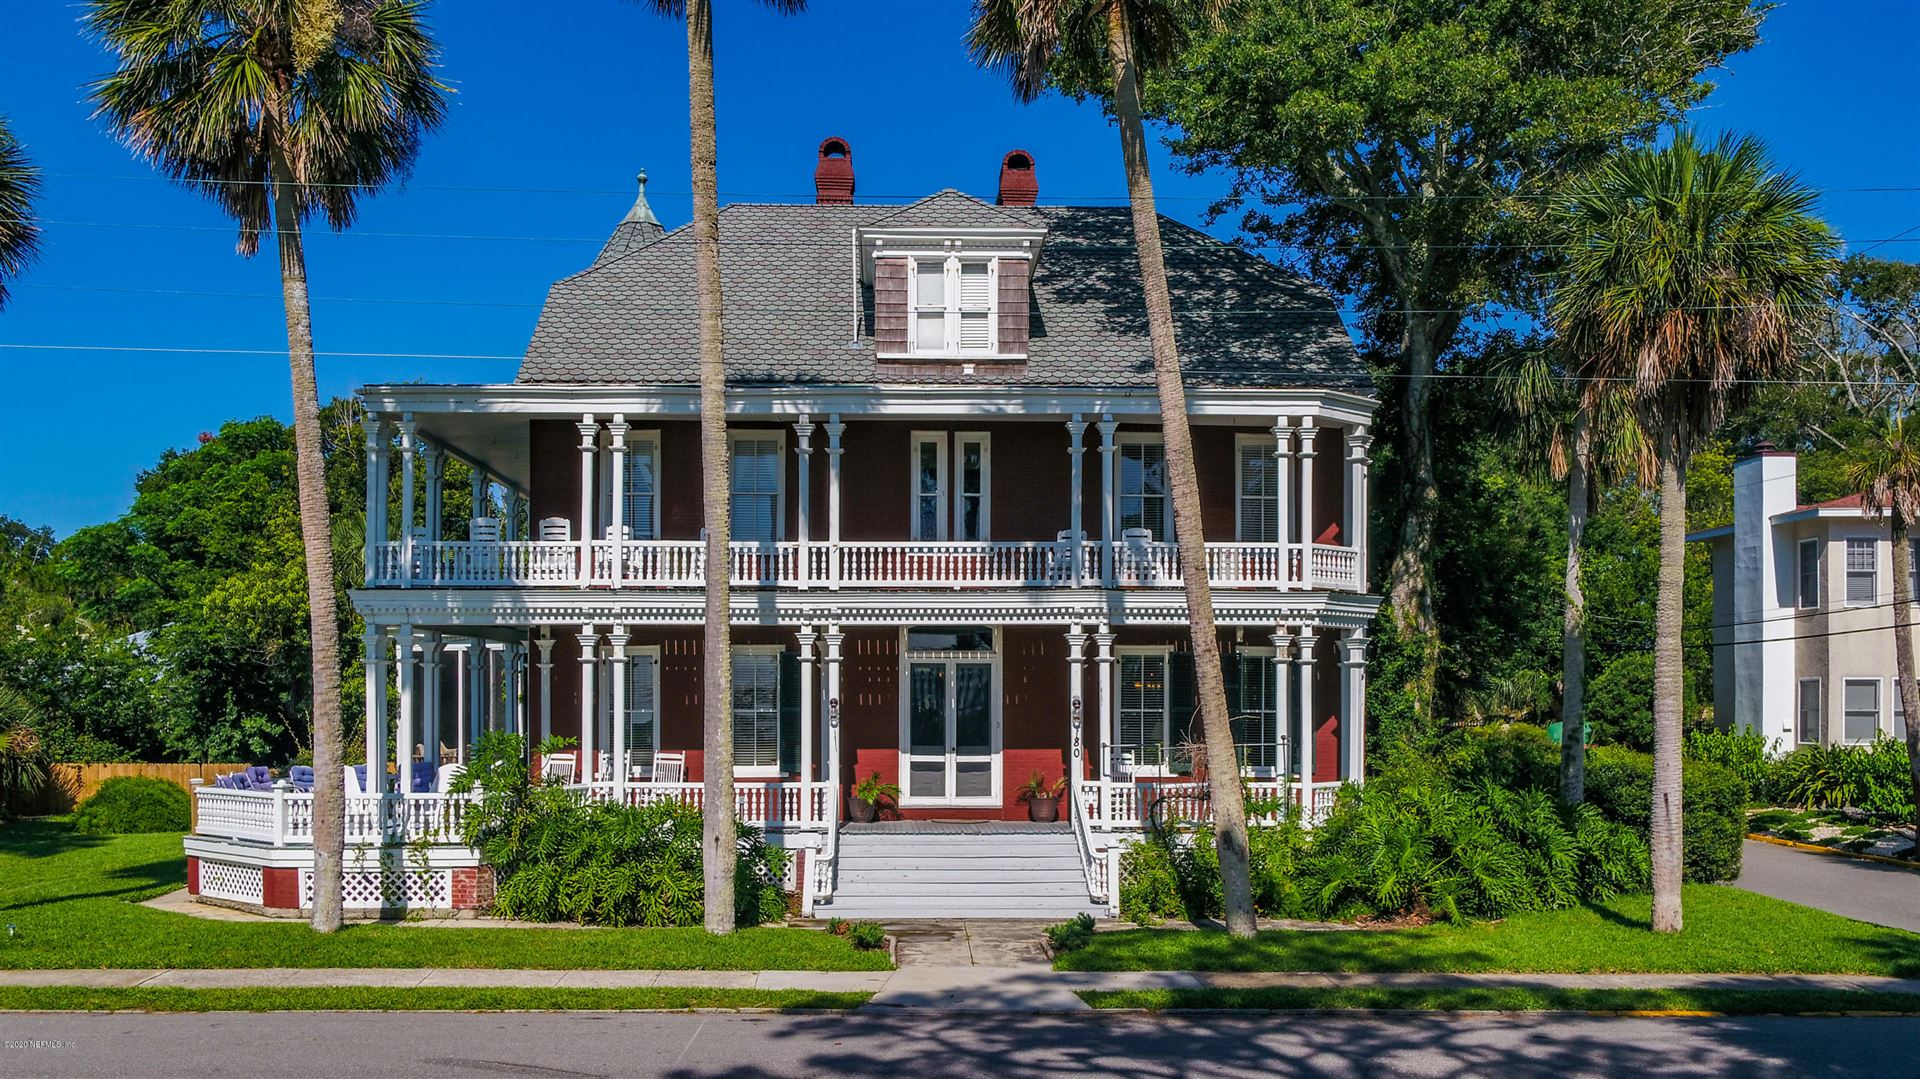 80 WATER ST, Saint Augustine, FL 32084 - MLS#: 1060511